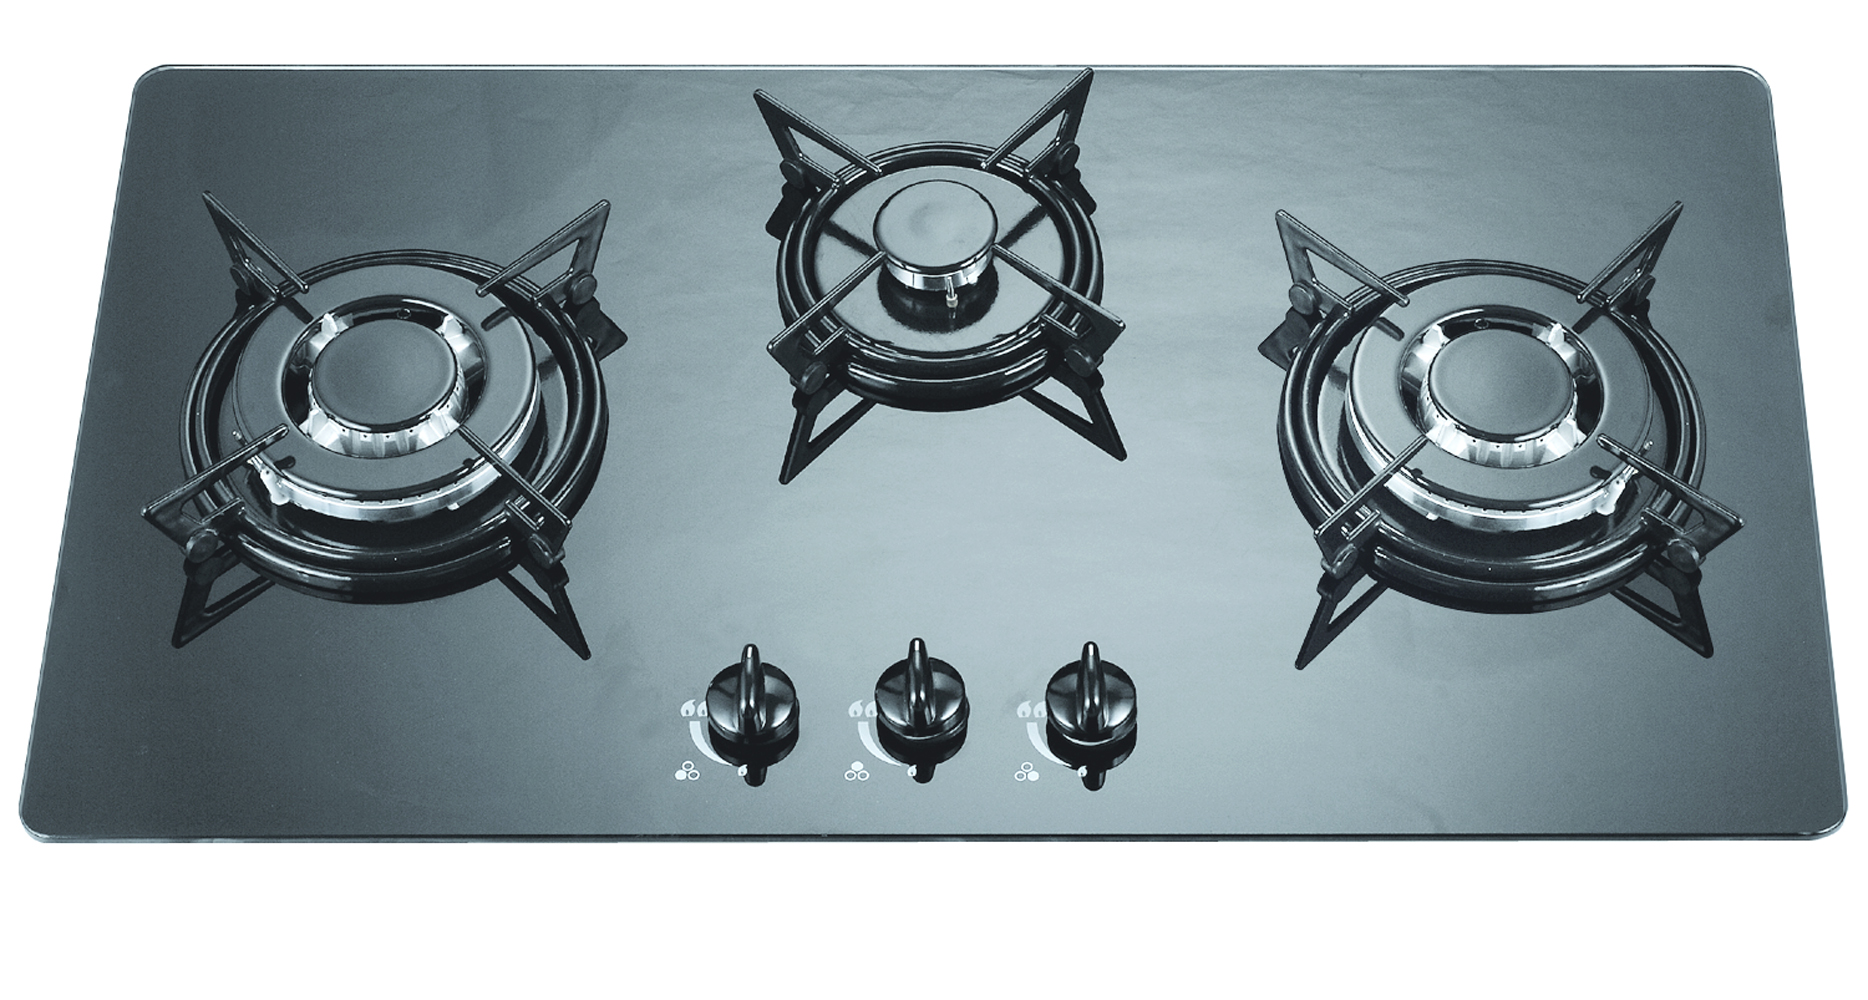 Official Zitalo Kitchen Appliances - Electric/Gas Hobs